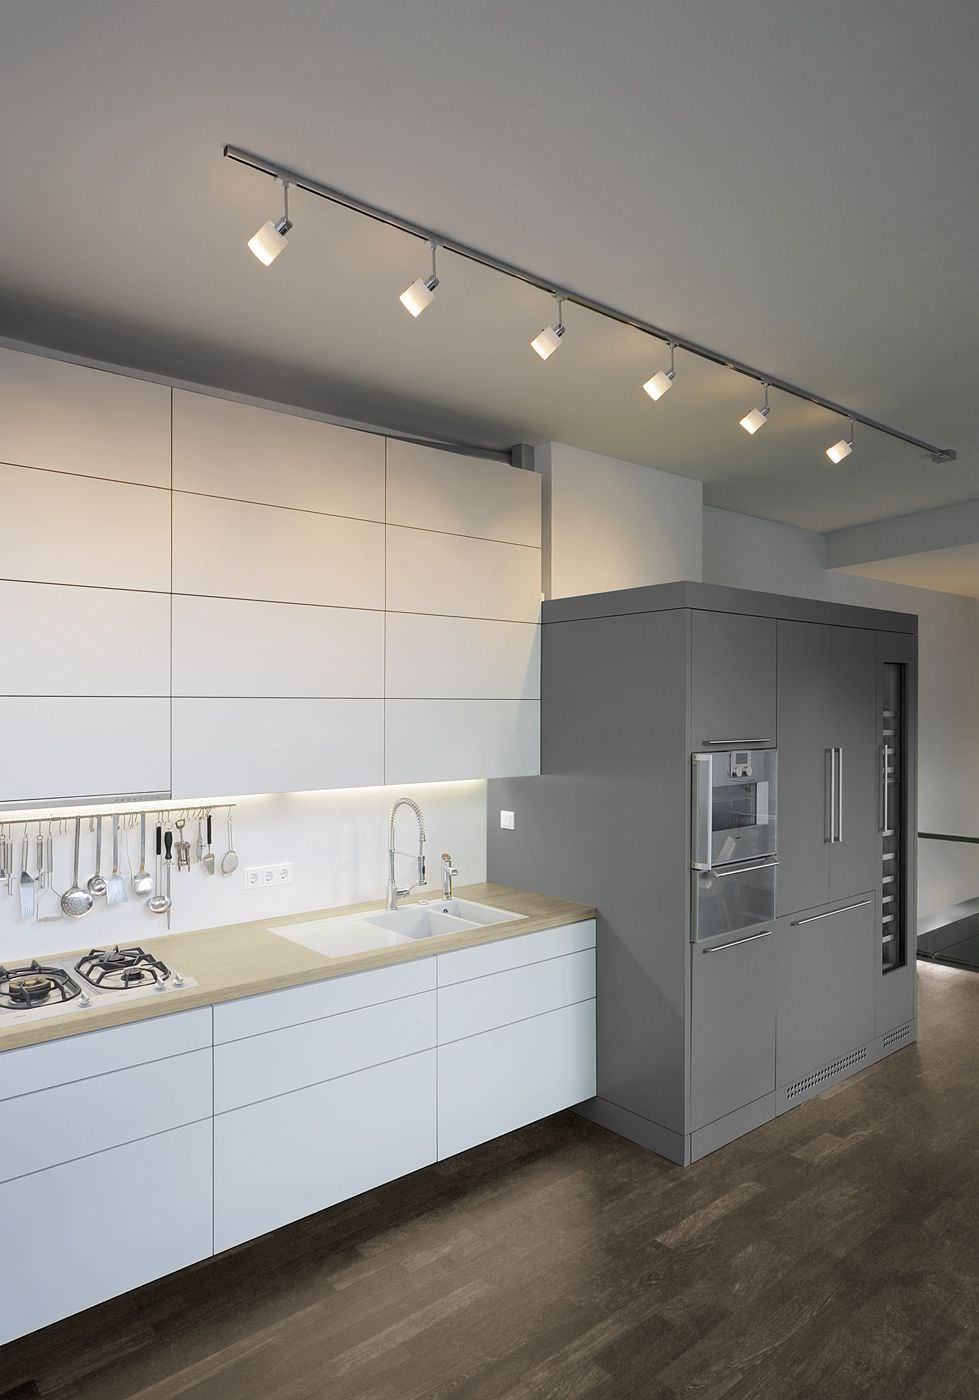 Rail Declairage Cerca Con Google Luminaire Lighting Kitchen Wiring Lights In Attic Spotlights Ceiling Track